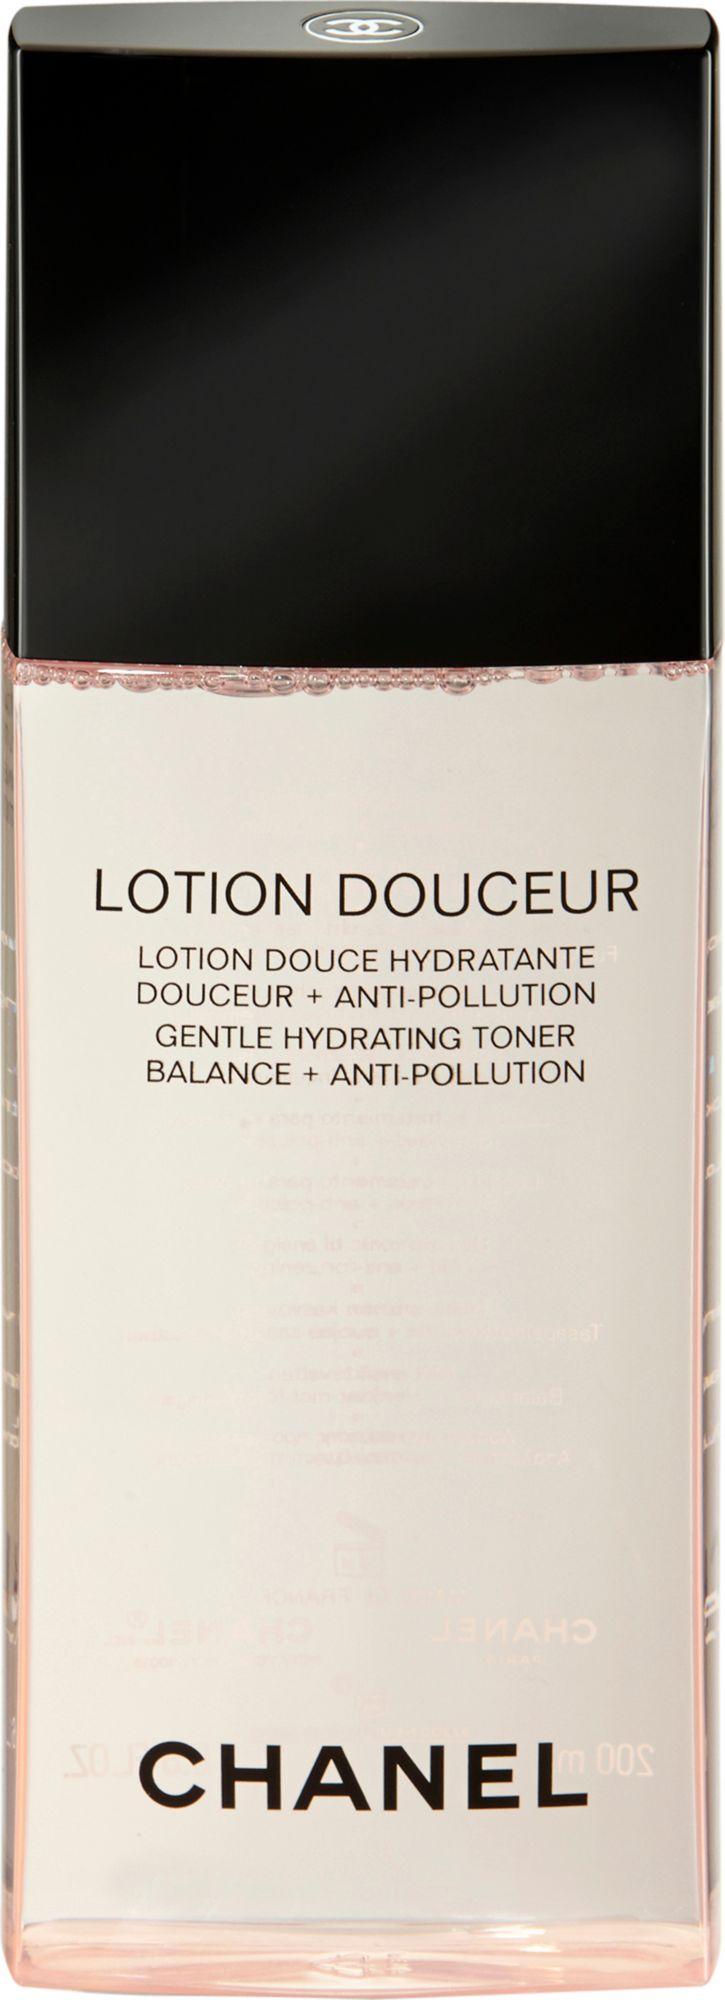 CHANEL Chanel, »Lotion Douceur«, Reinigungslotion